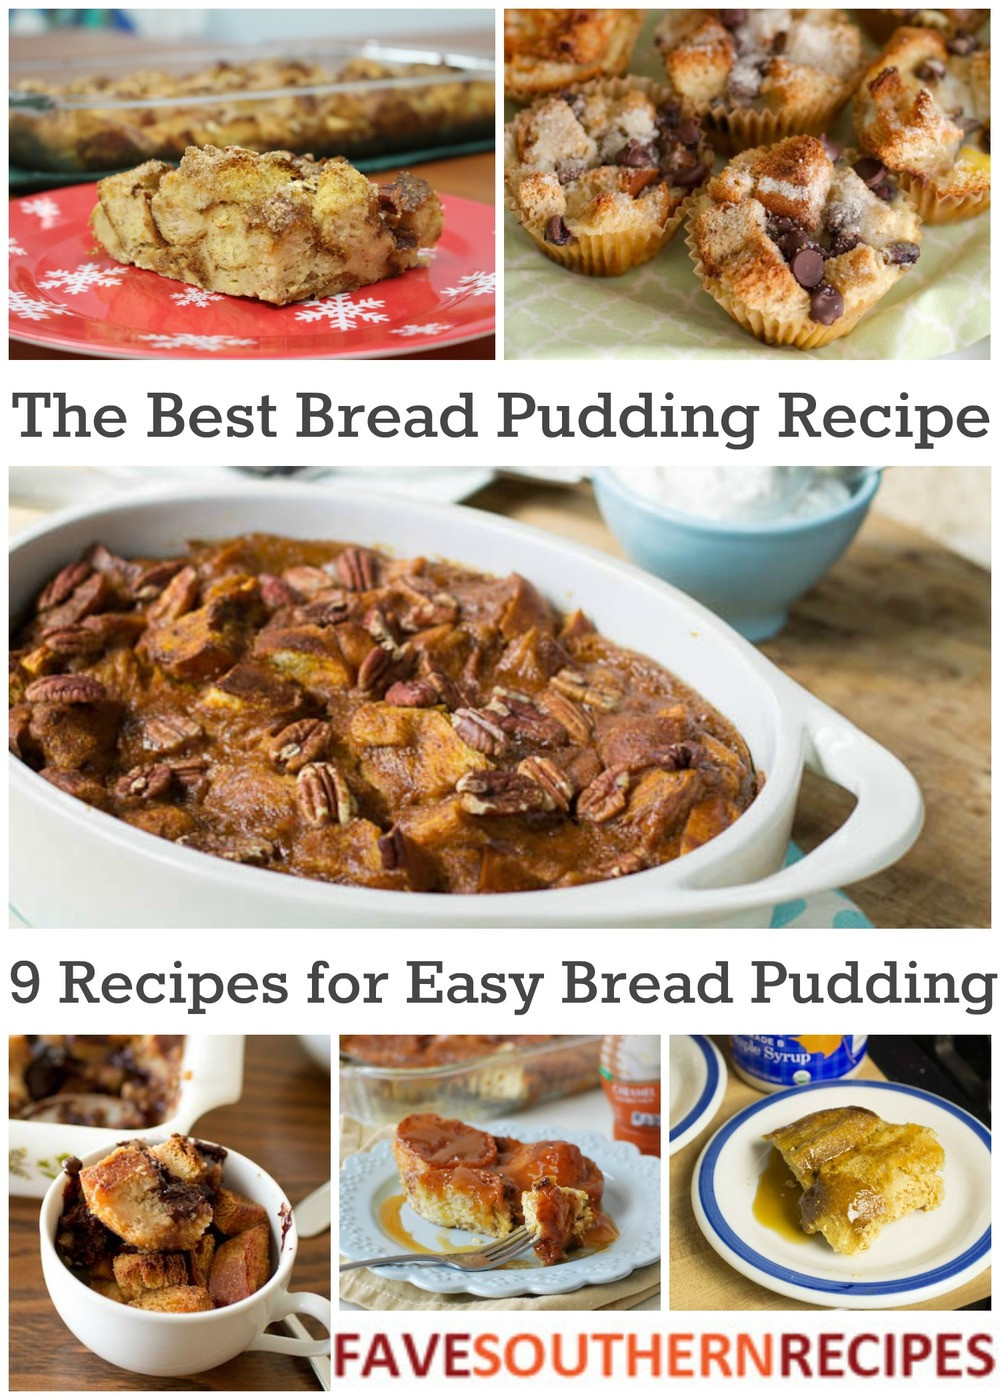 Best Bread Pudding Recipe  The Best Bread Pudding Recipe 9 Recipes for Easy Bread